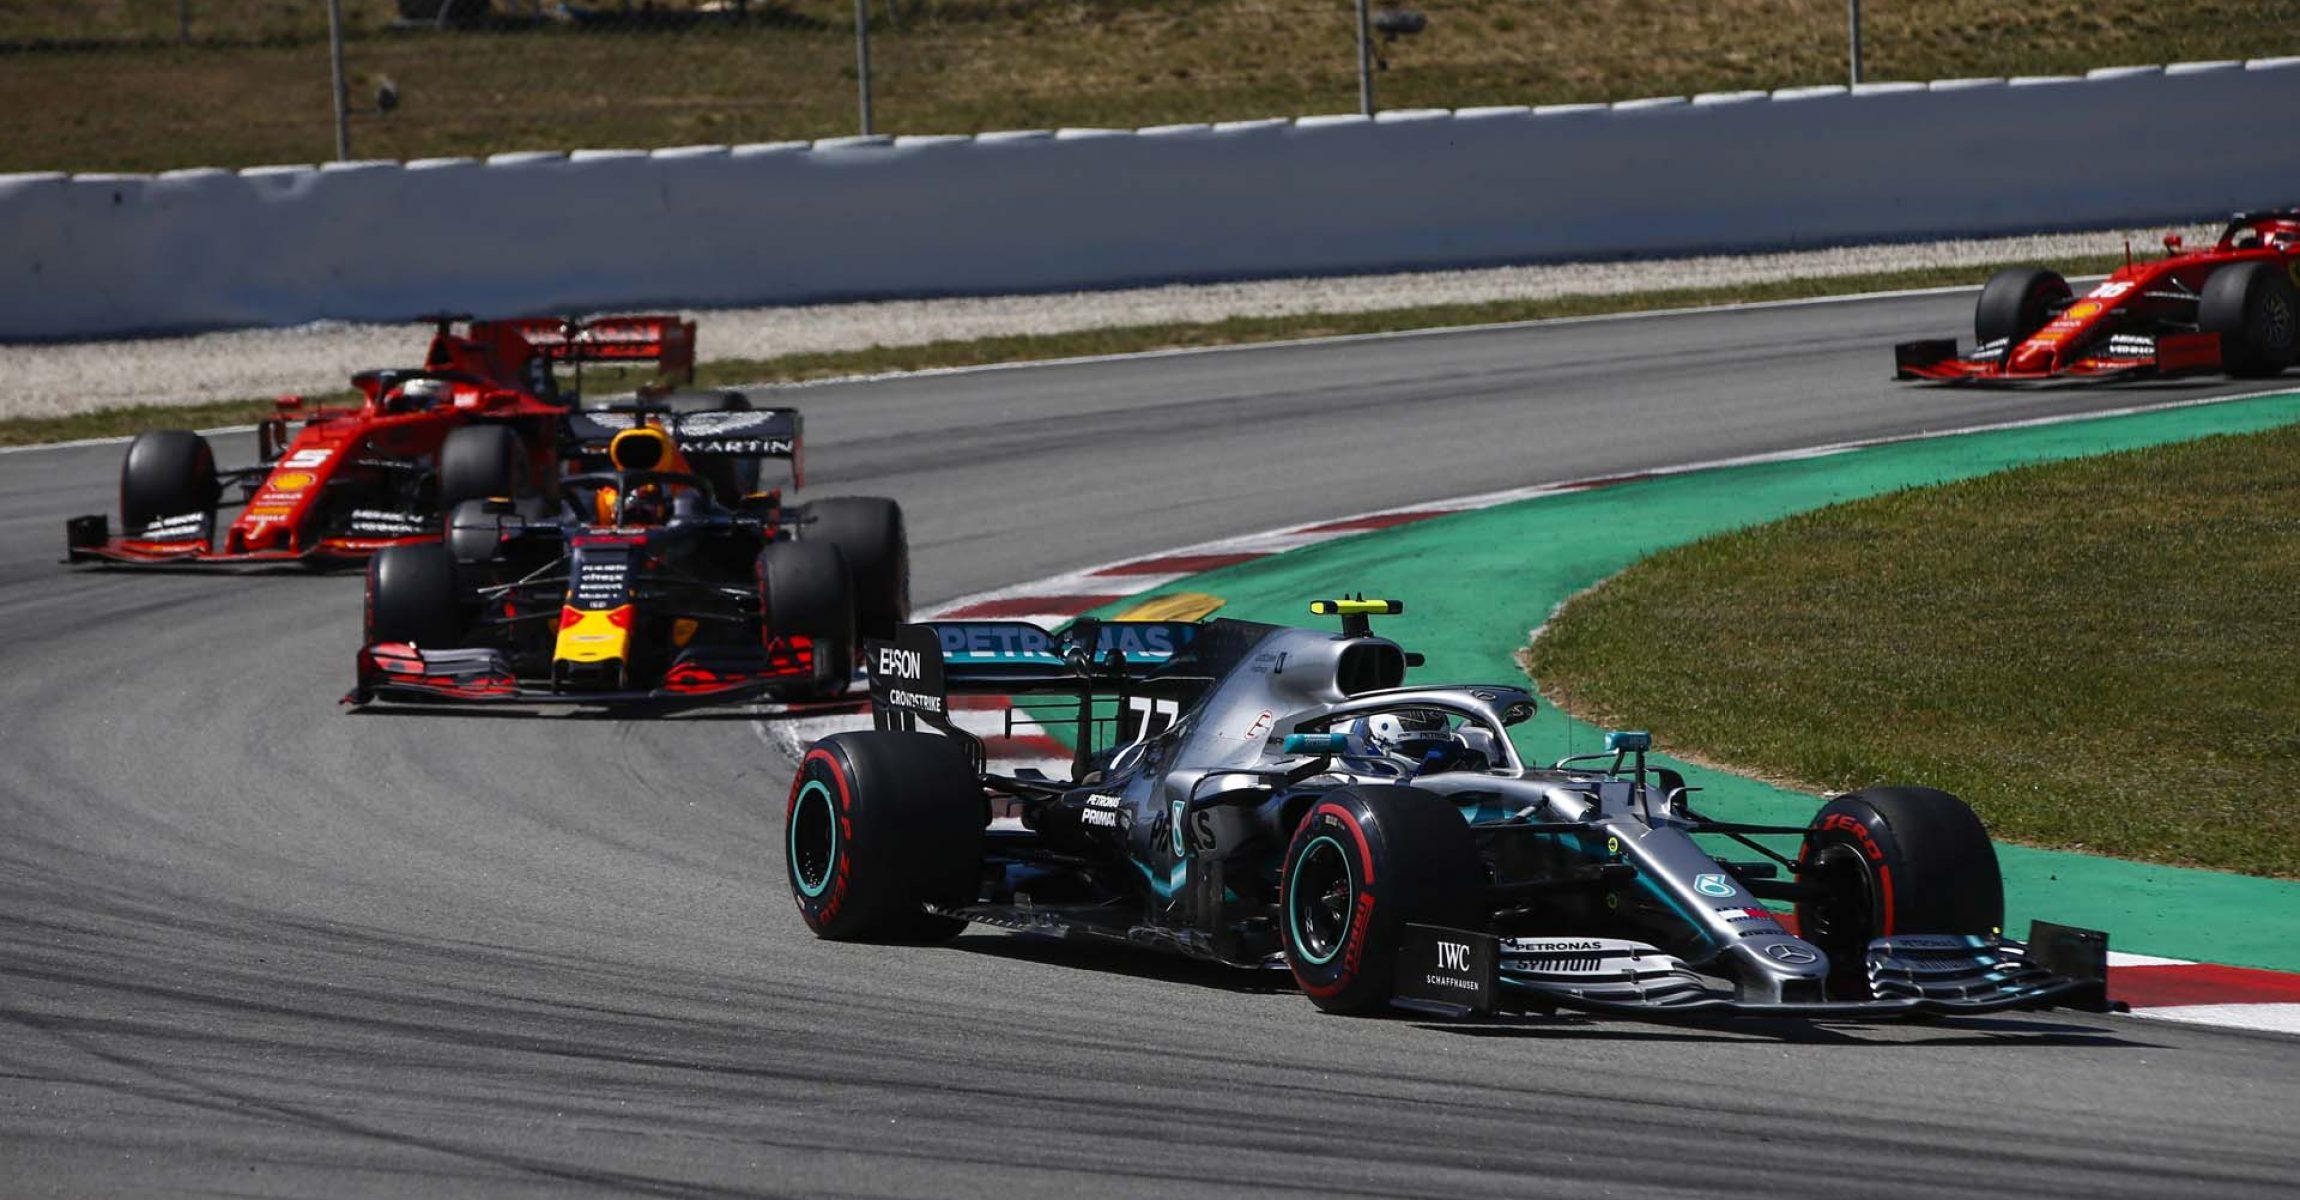 2019 Spanish Grand Prix, Sunday - LAT Images Valtteri Bottas, Mercedes, Red Bull, Ferrari